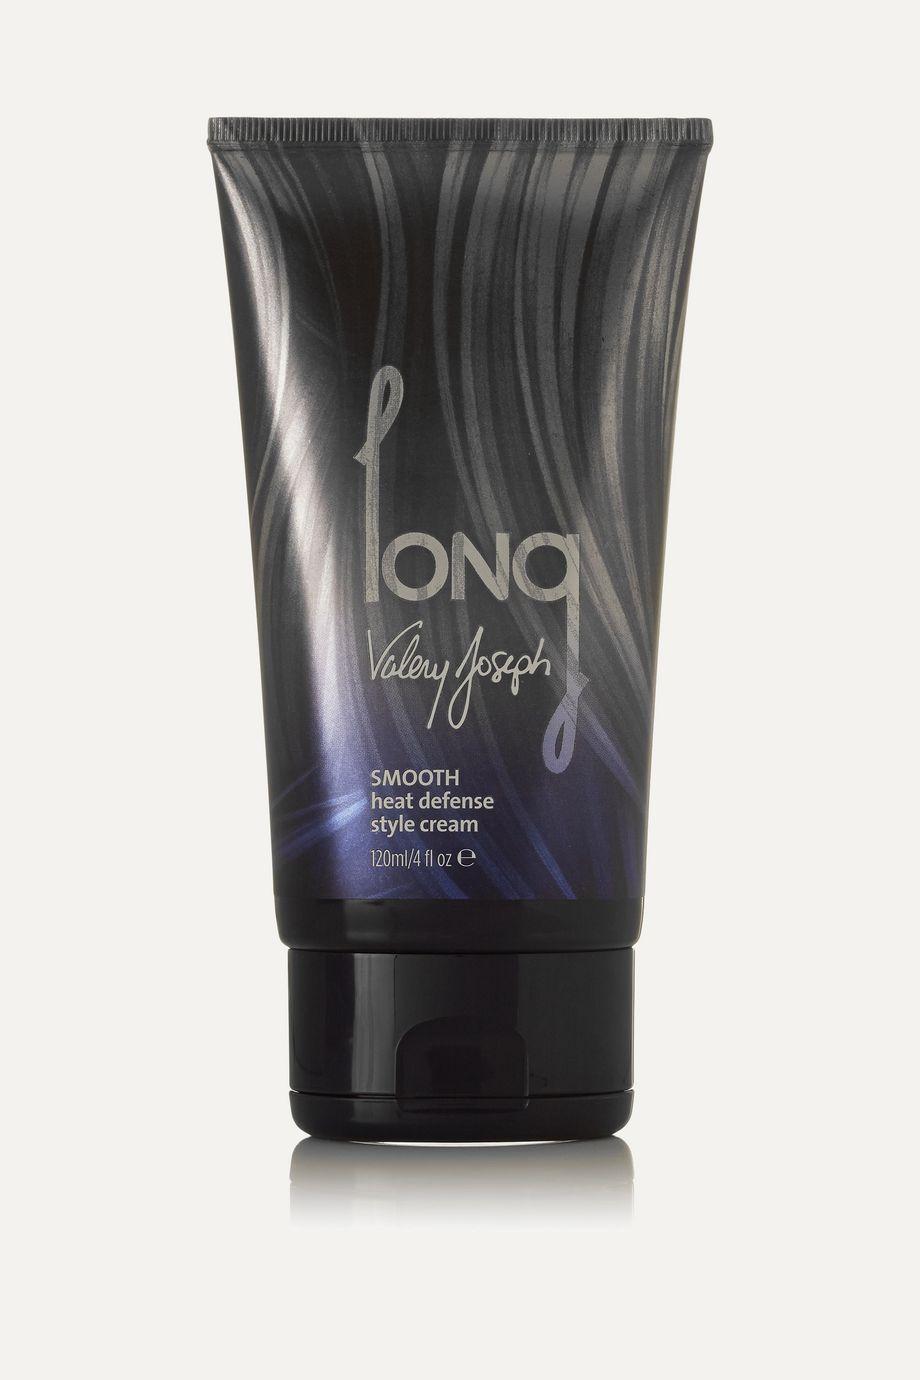 Long by Valery Joseph Smooth Heat Defense Style Cream - 120ml